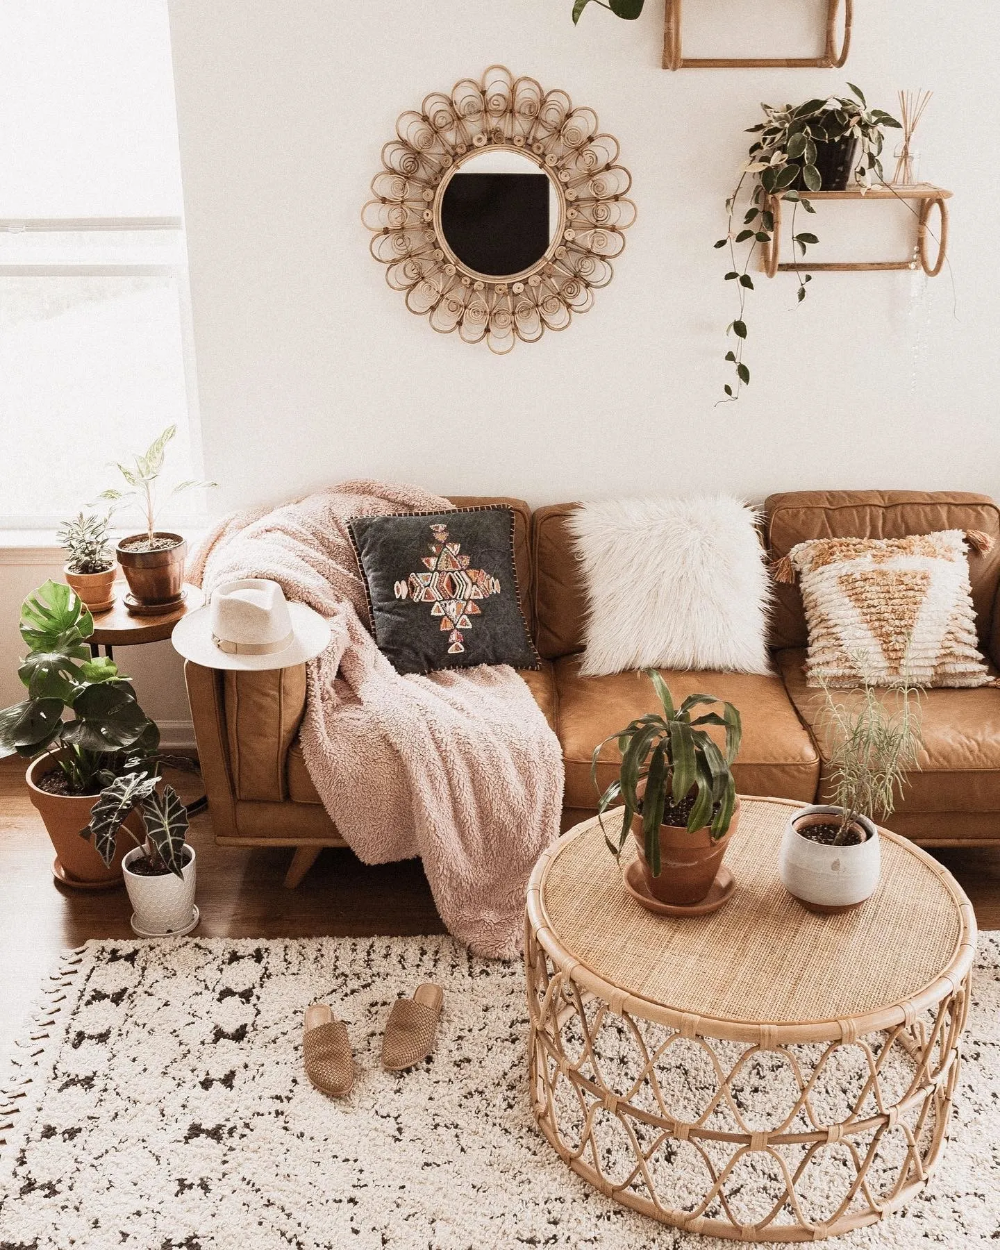 Timber Charme Tan Sofa Boho Living Room Living Room Designs Home Decor #tan #furniture #living #room